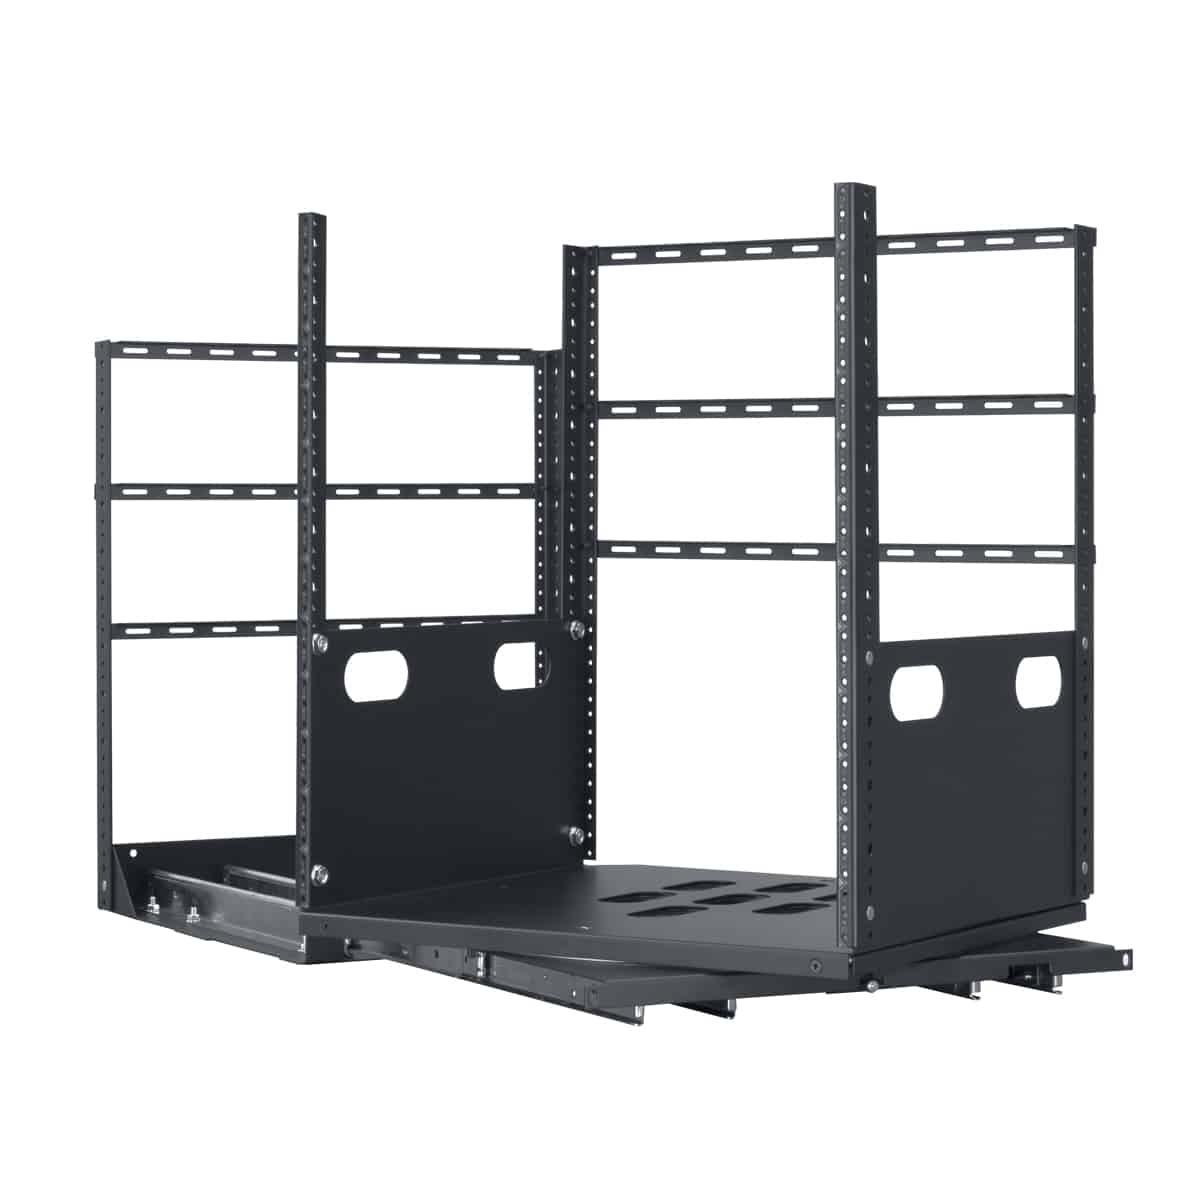 LPTR Pull & Turn Rack